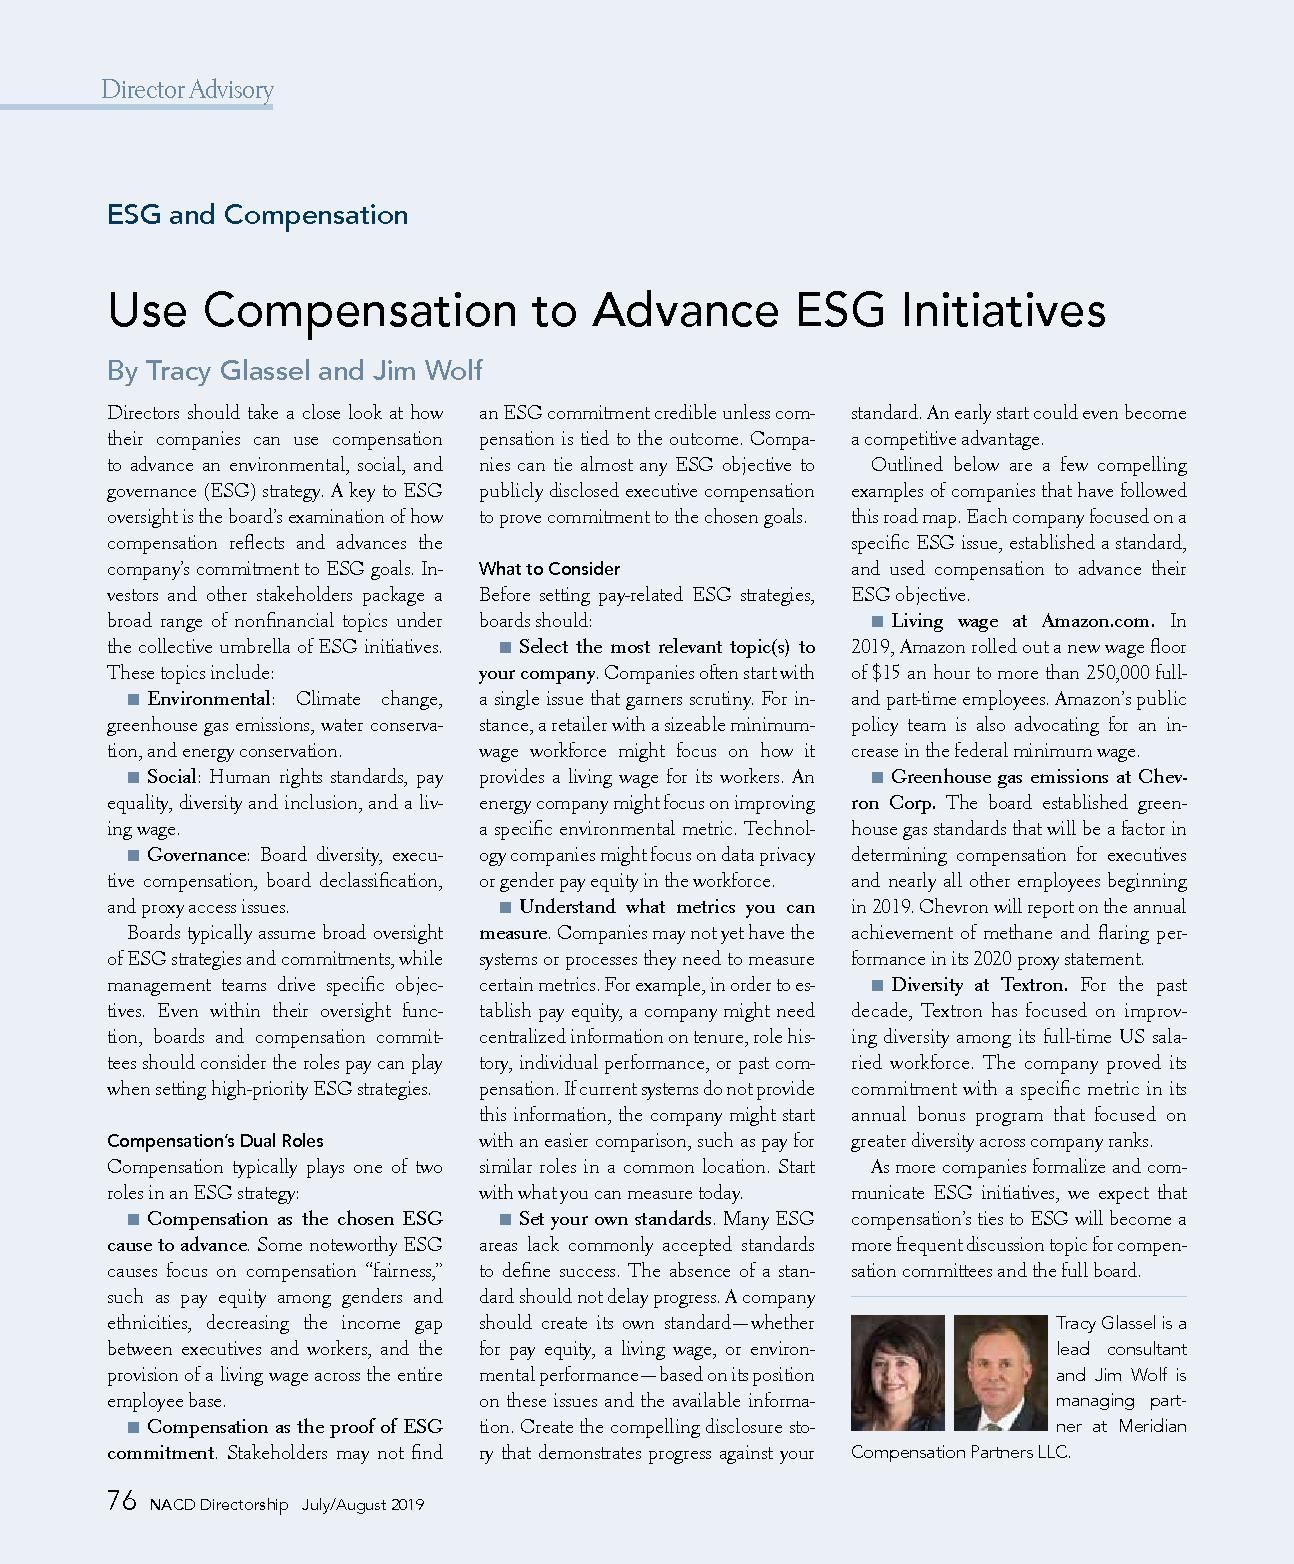 Use Compensation to Advance ESG Initiatives (PDF)